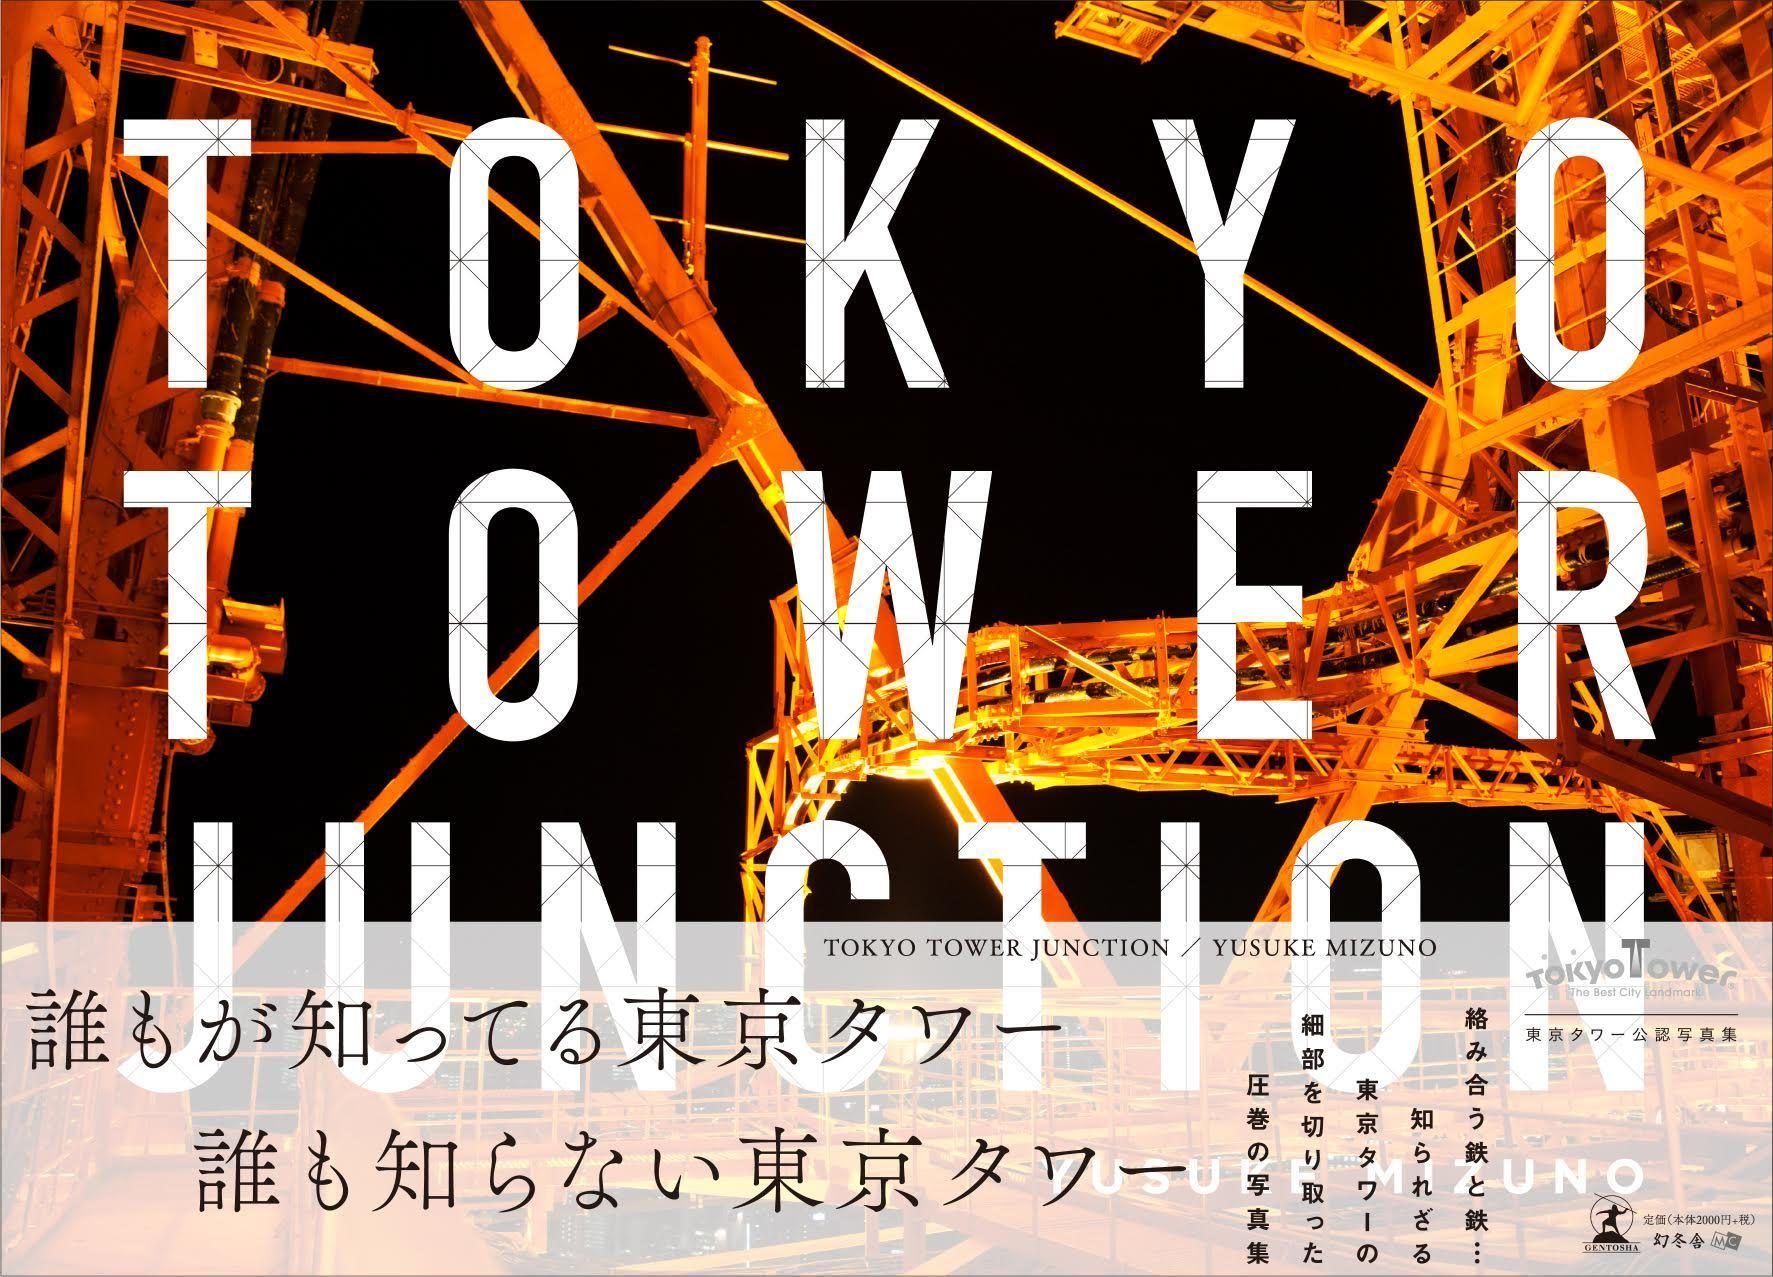 「TOKYO TOWER JUNCTION」書影(帯あり)のコピー.jpg